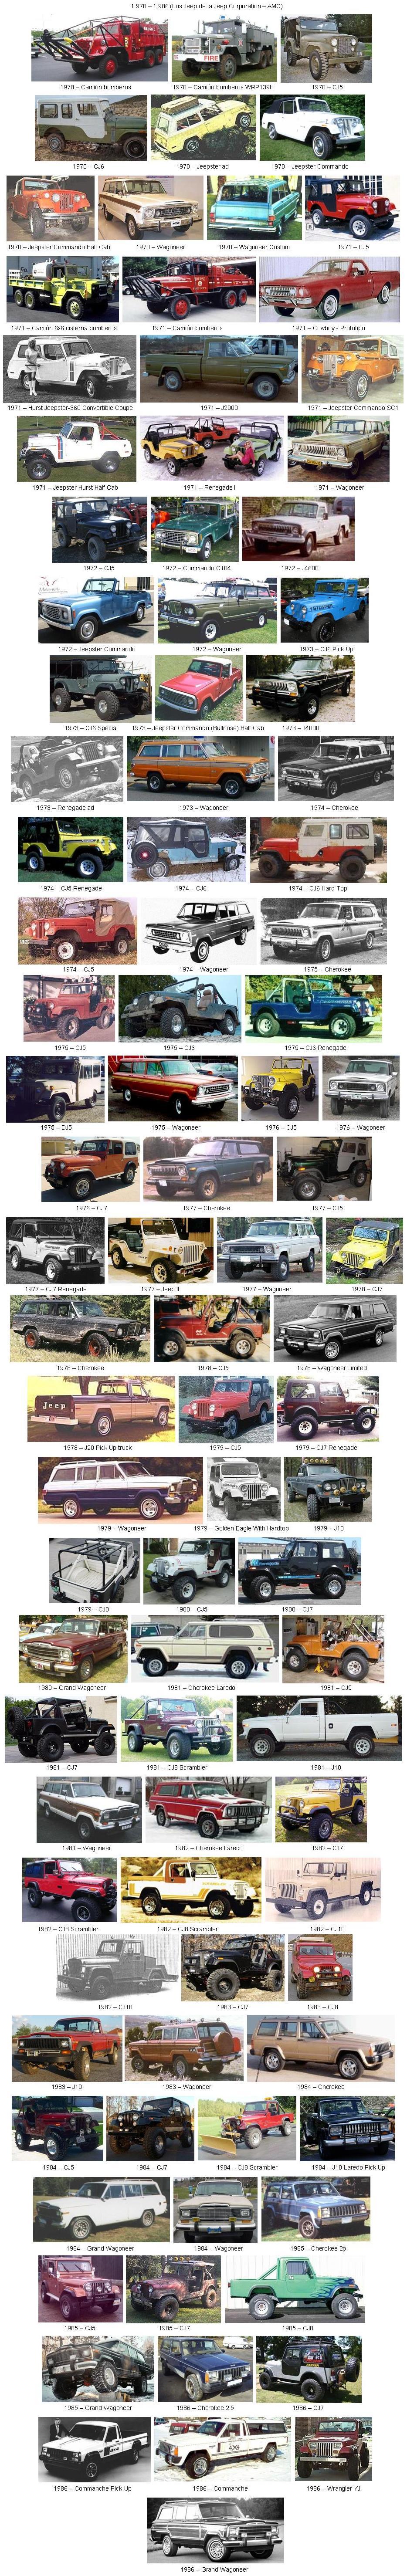 Historia Gráfica de la Jeep JEEP-05-(1970-1986)-(Jeep%20Corporation%20-%20AMC)